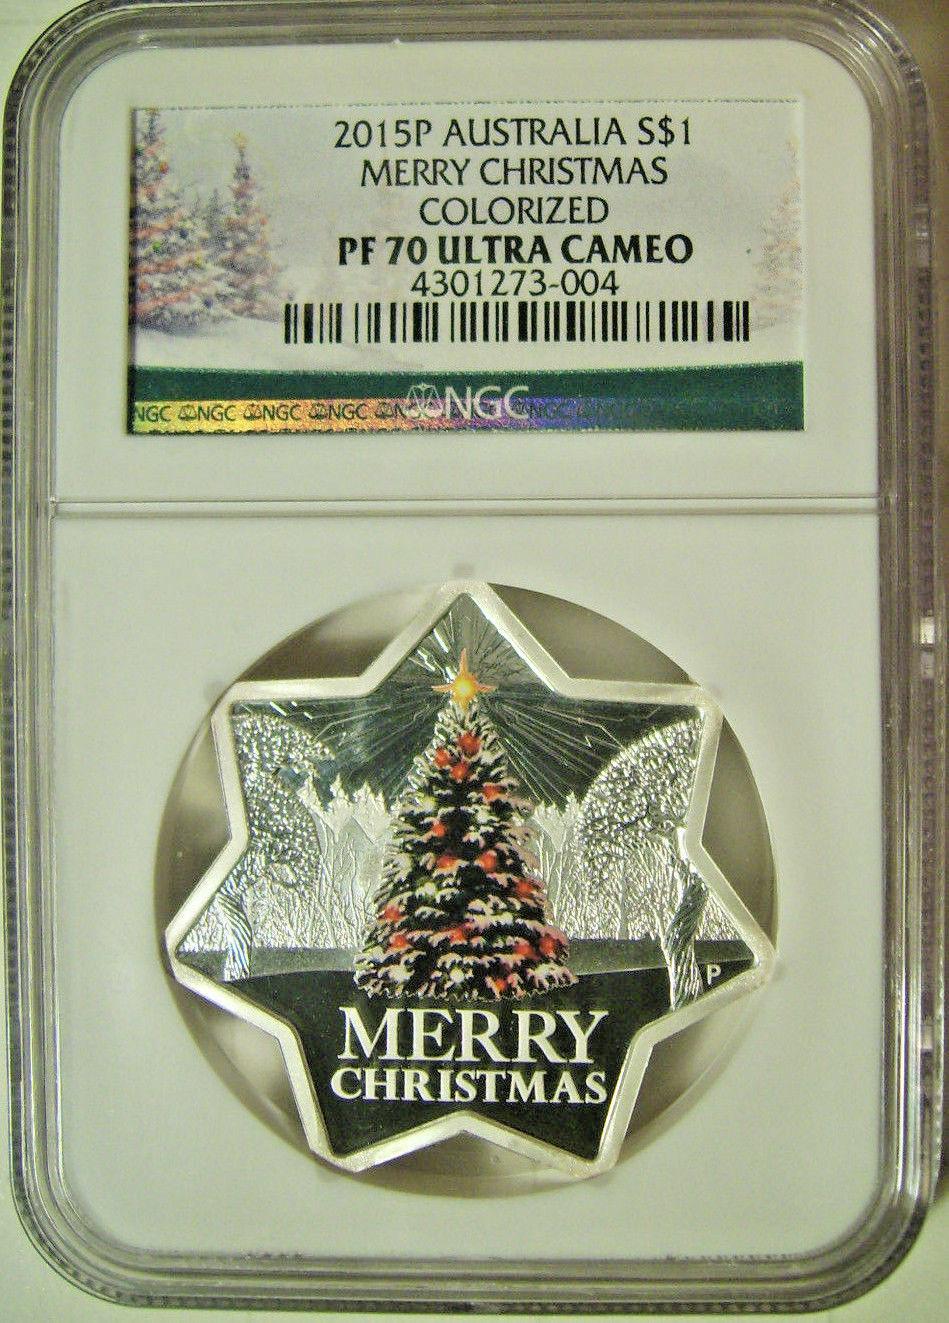 Australia Christmas Tree 2016 1oz Star Shaped Silver Proof $1 Coin